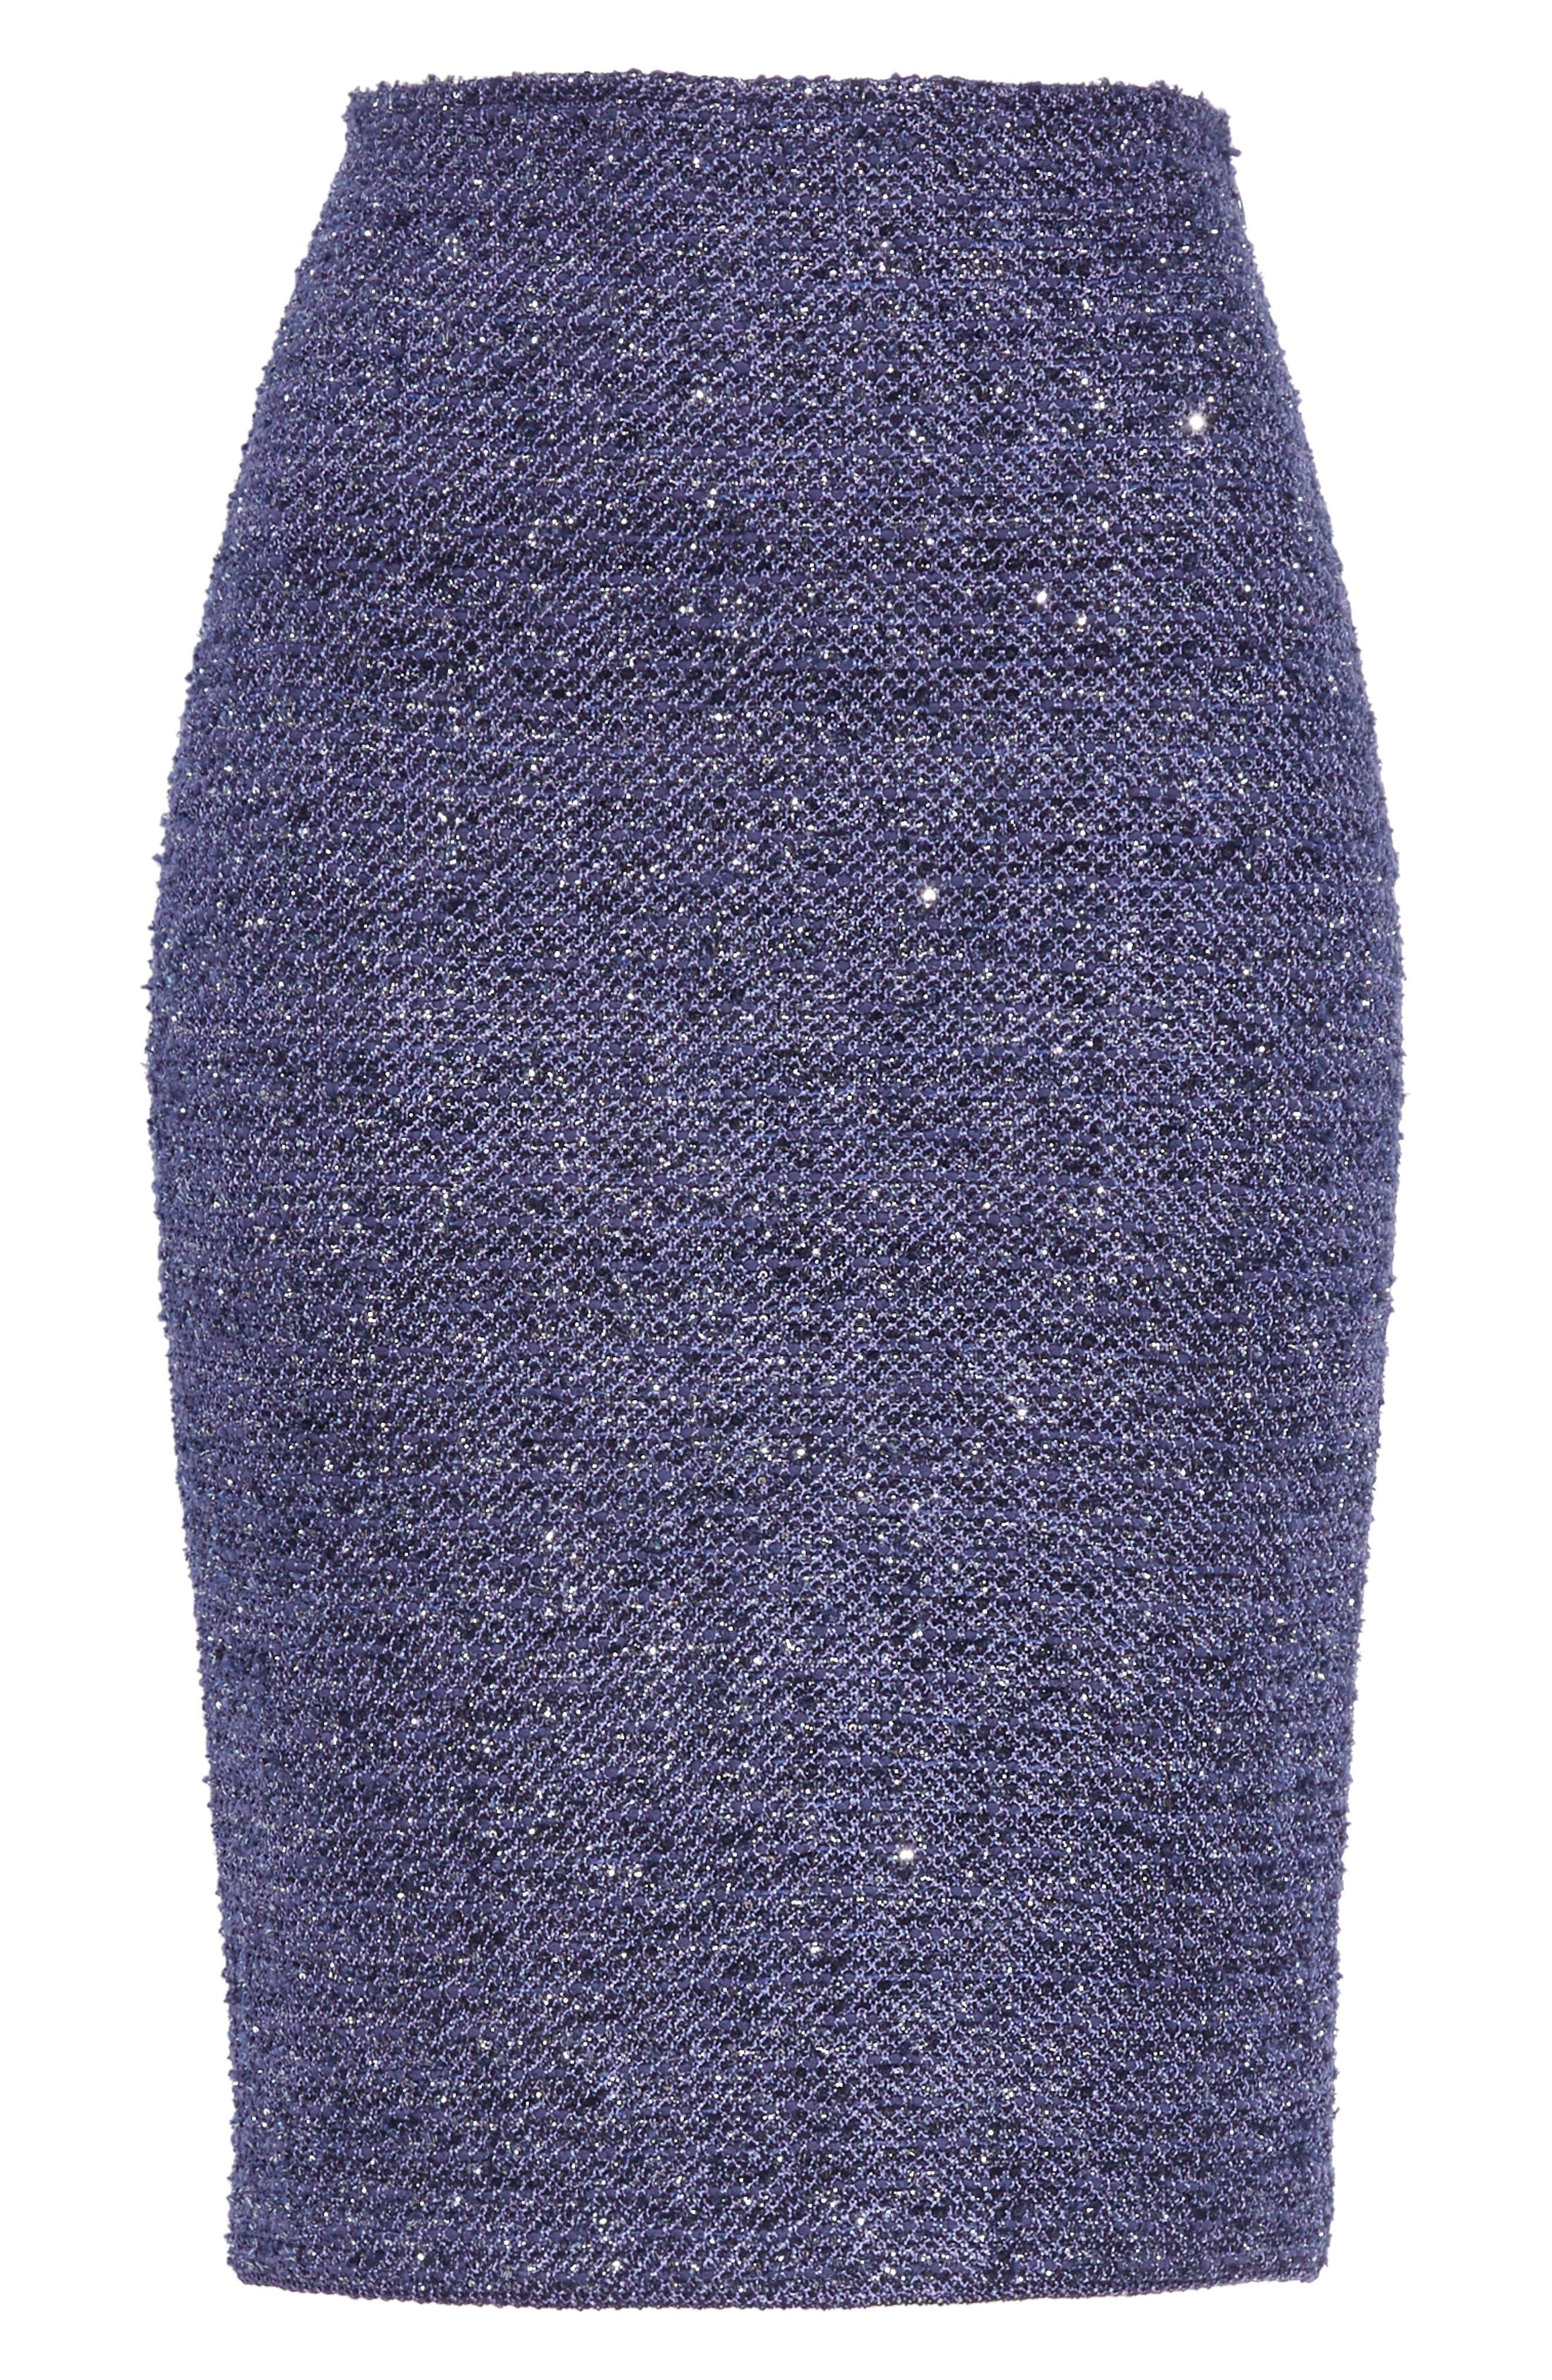 Starlight Knit Pencil Skirt,                             Alternate thumbnail 6, color,                             VIOLA MULTI